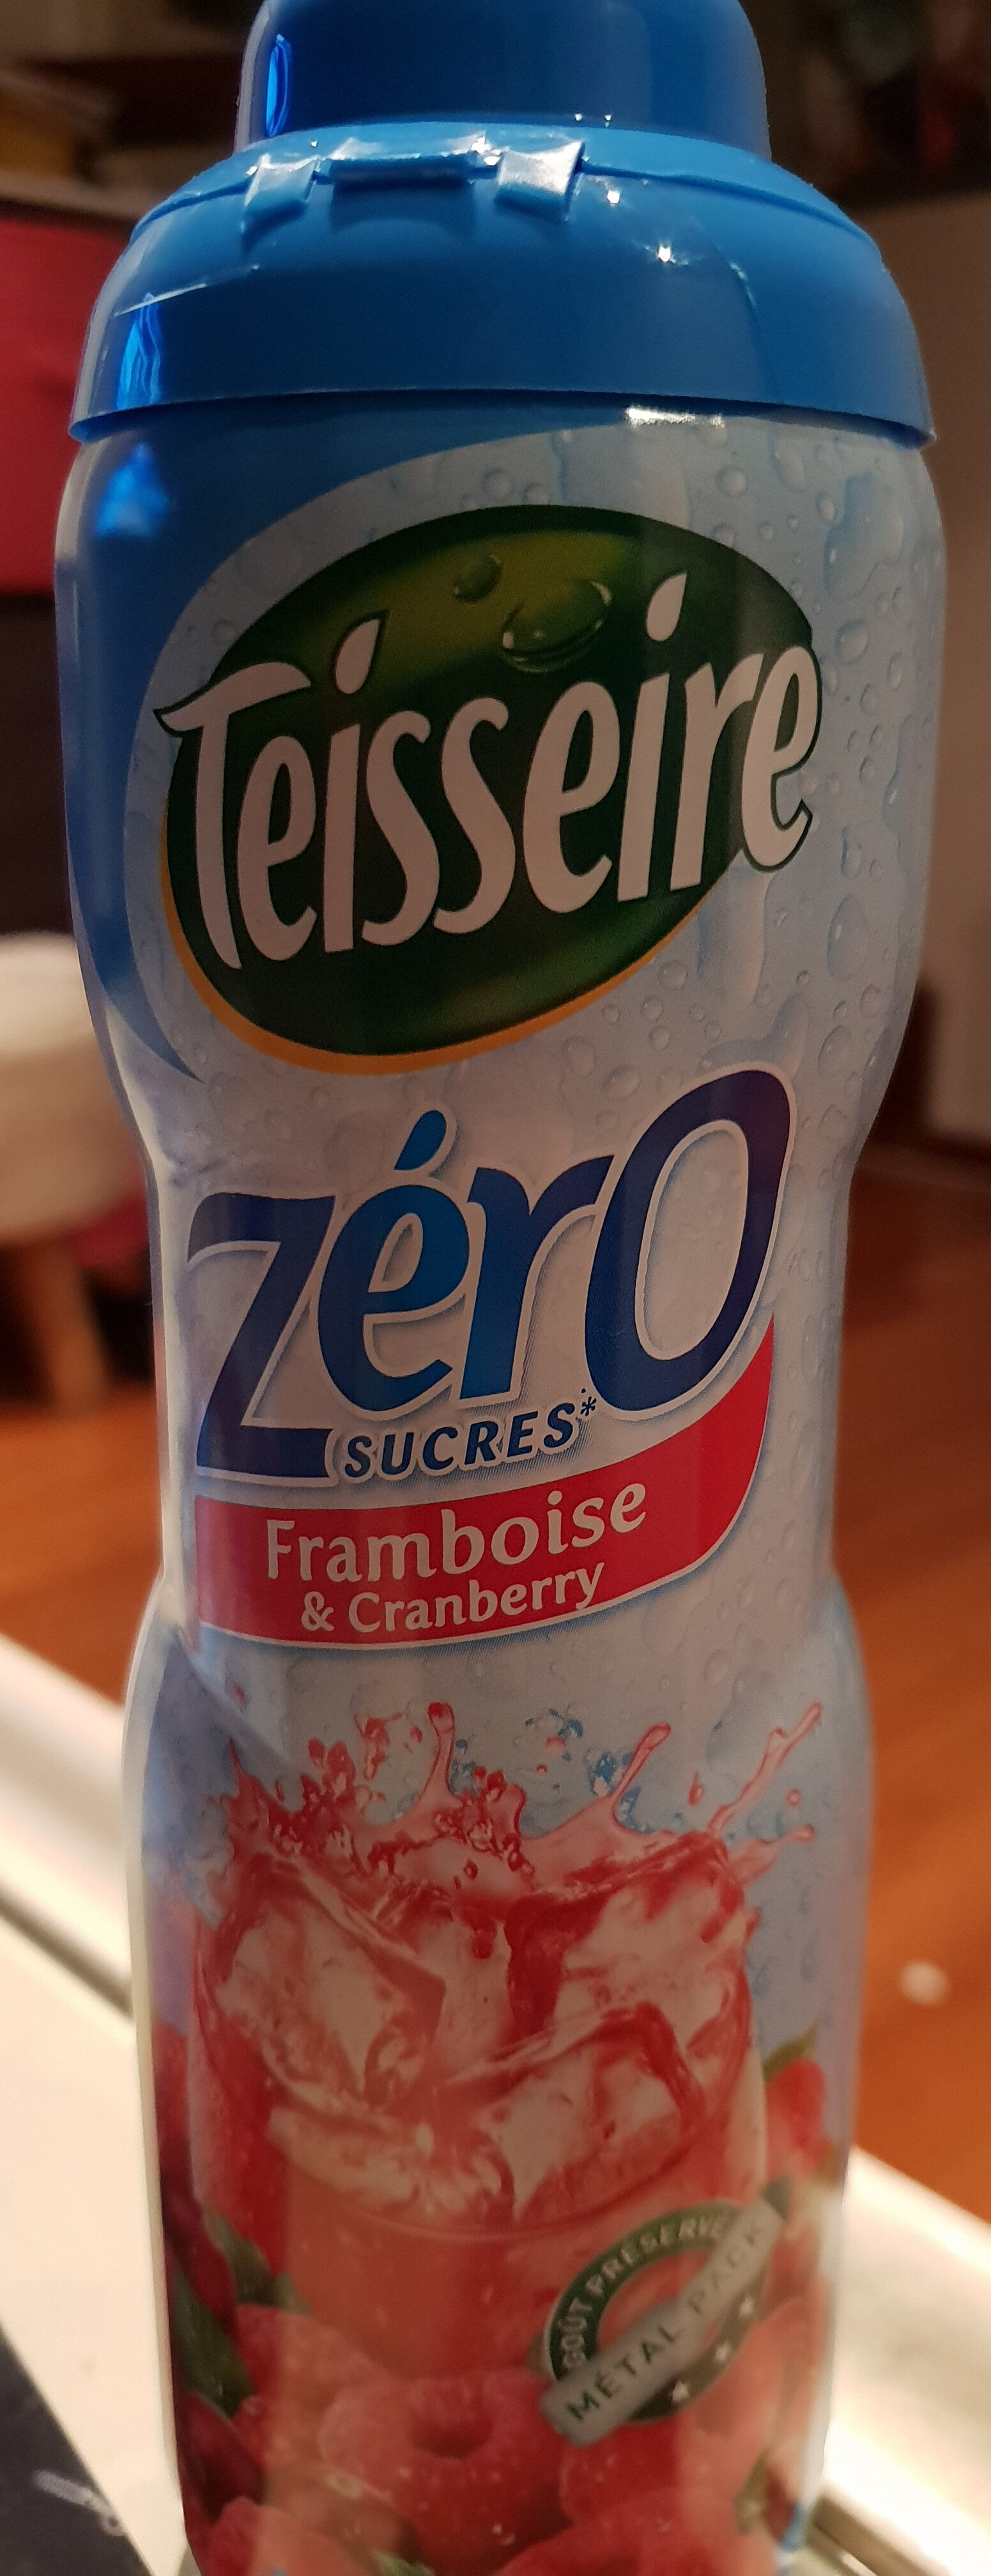 Sirop framboise et cranberry zéro sucre - Prodotto - fr